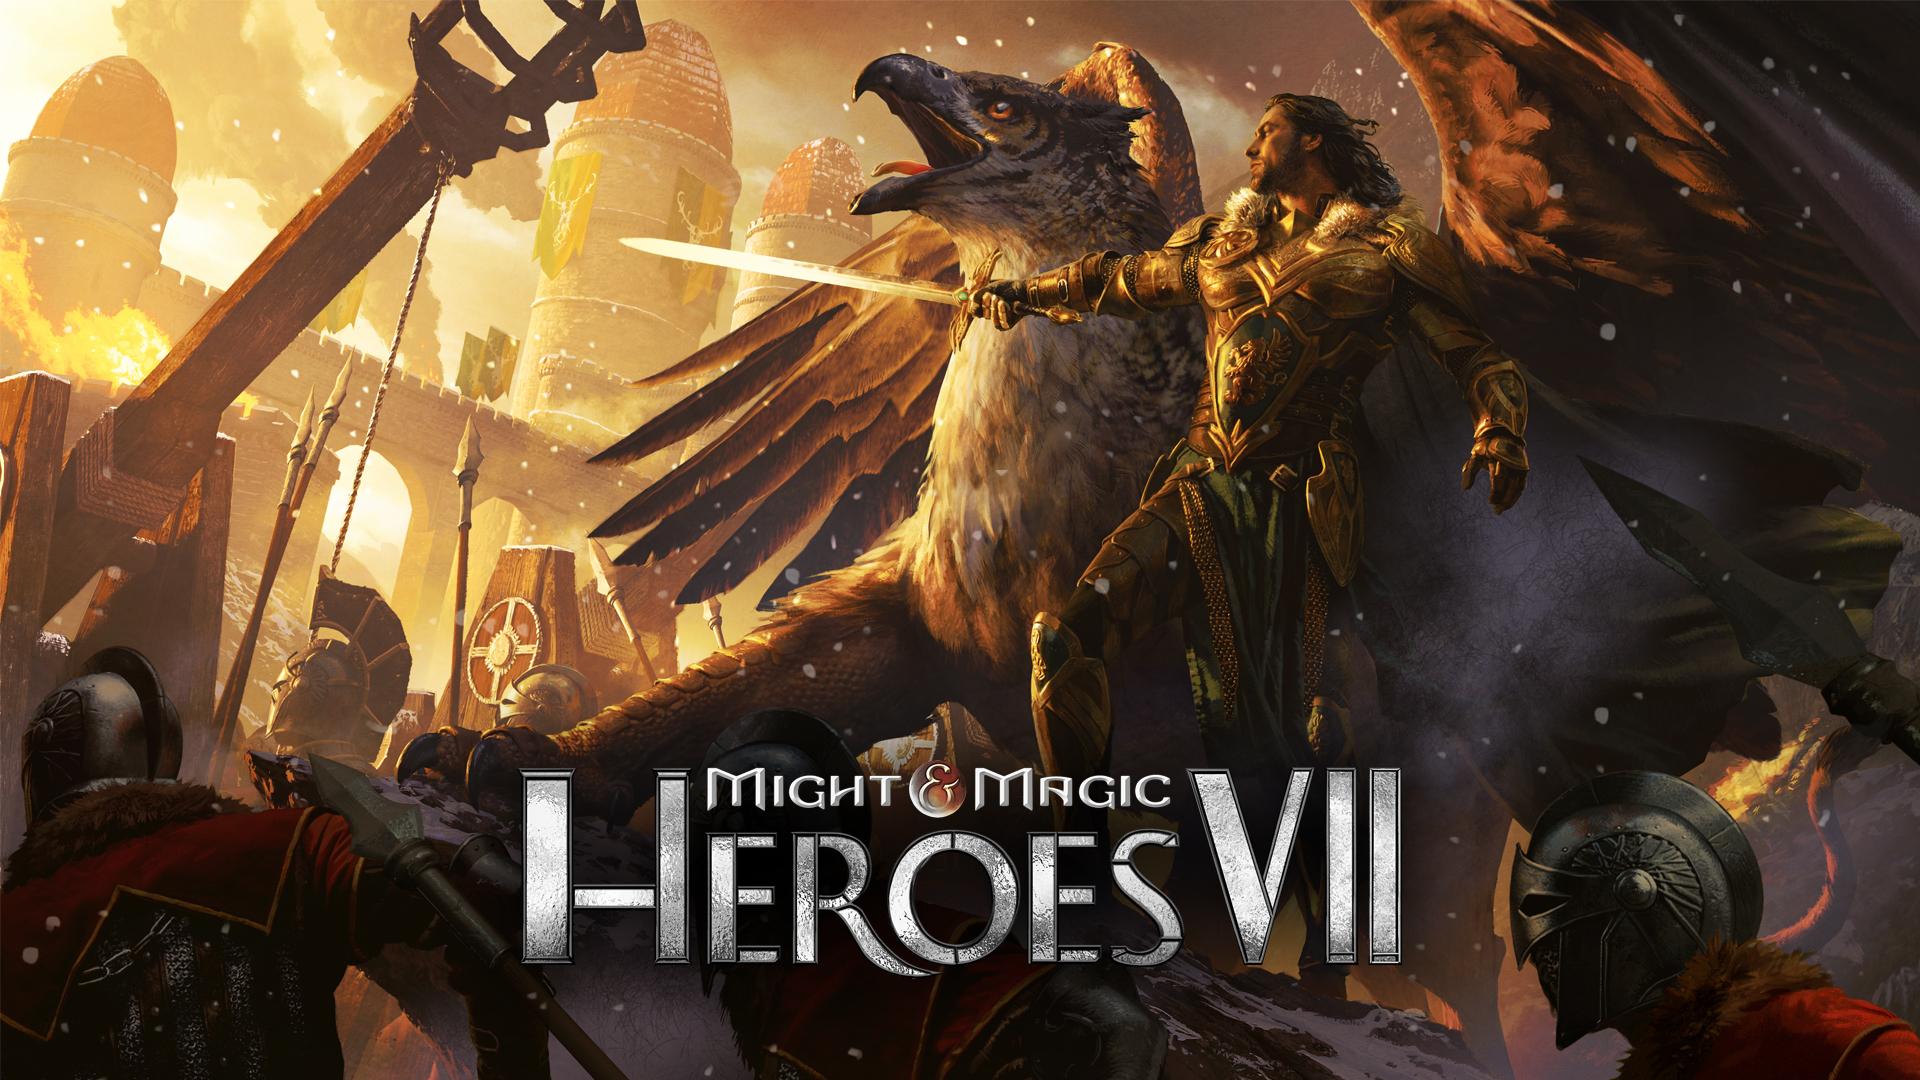 Might & Magic Heroes VII / Меч и Магия Герои VII (RUS/ENG/MULTI13) [Repack]